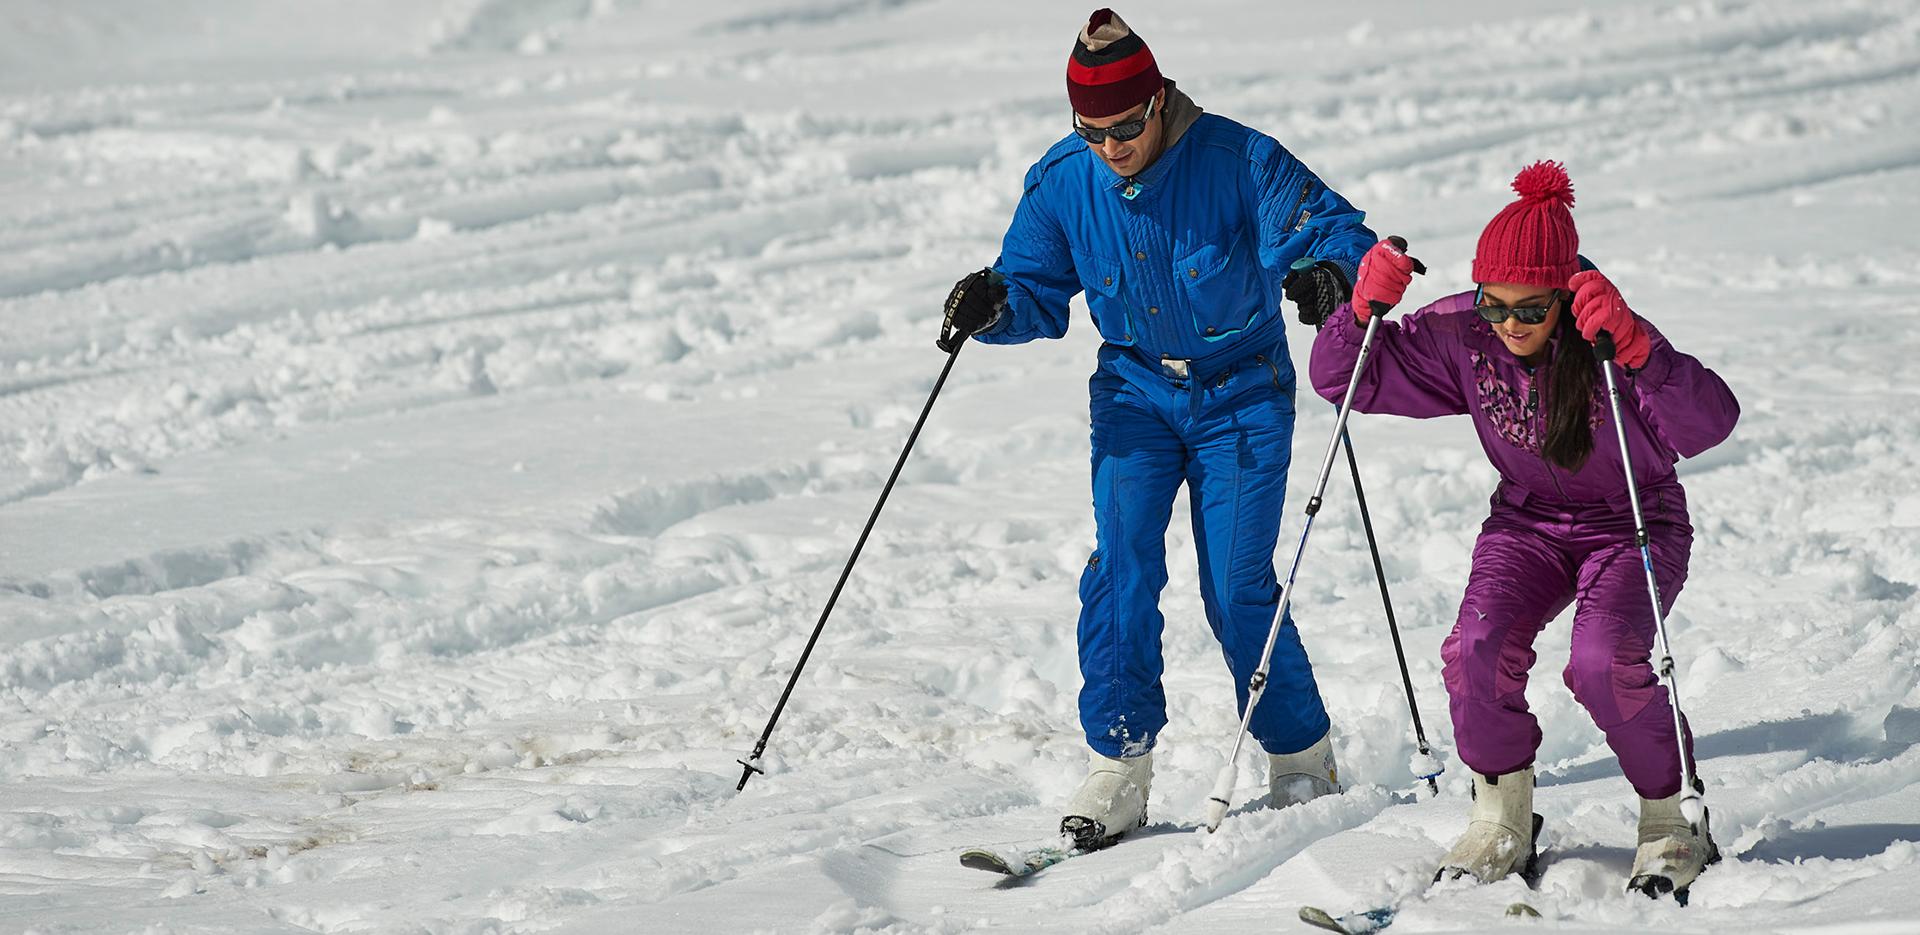 Ski Destination in India